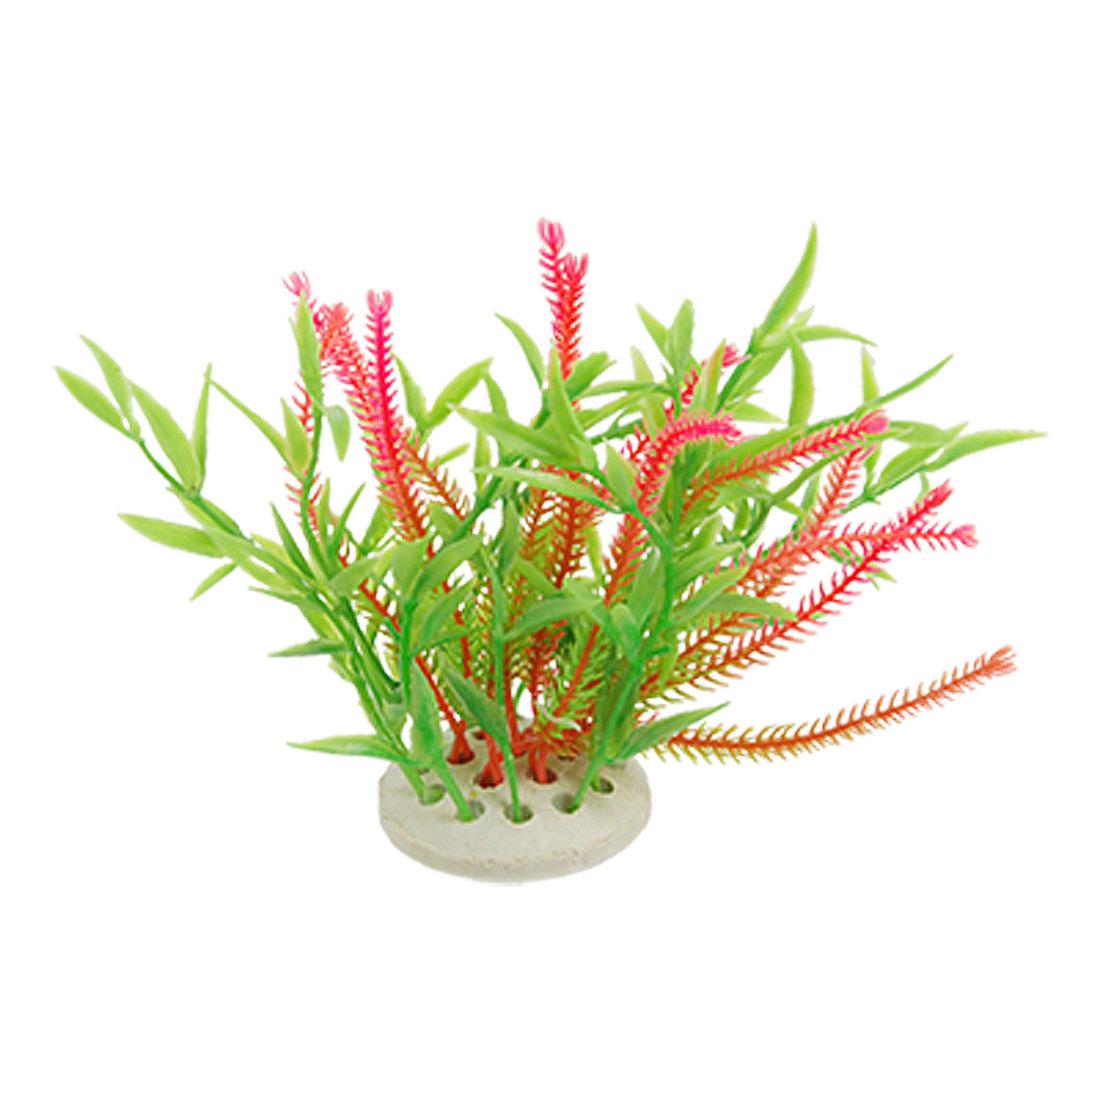 Fish Tank Round Ceramic Base Pink Green Plastic Plant Decoration